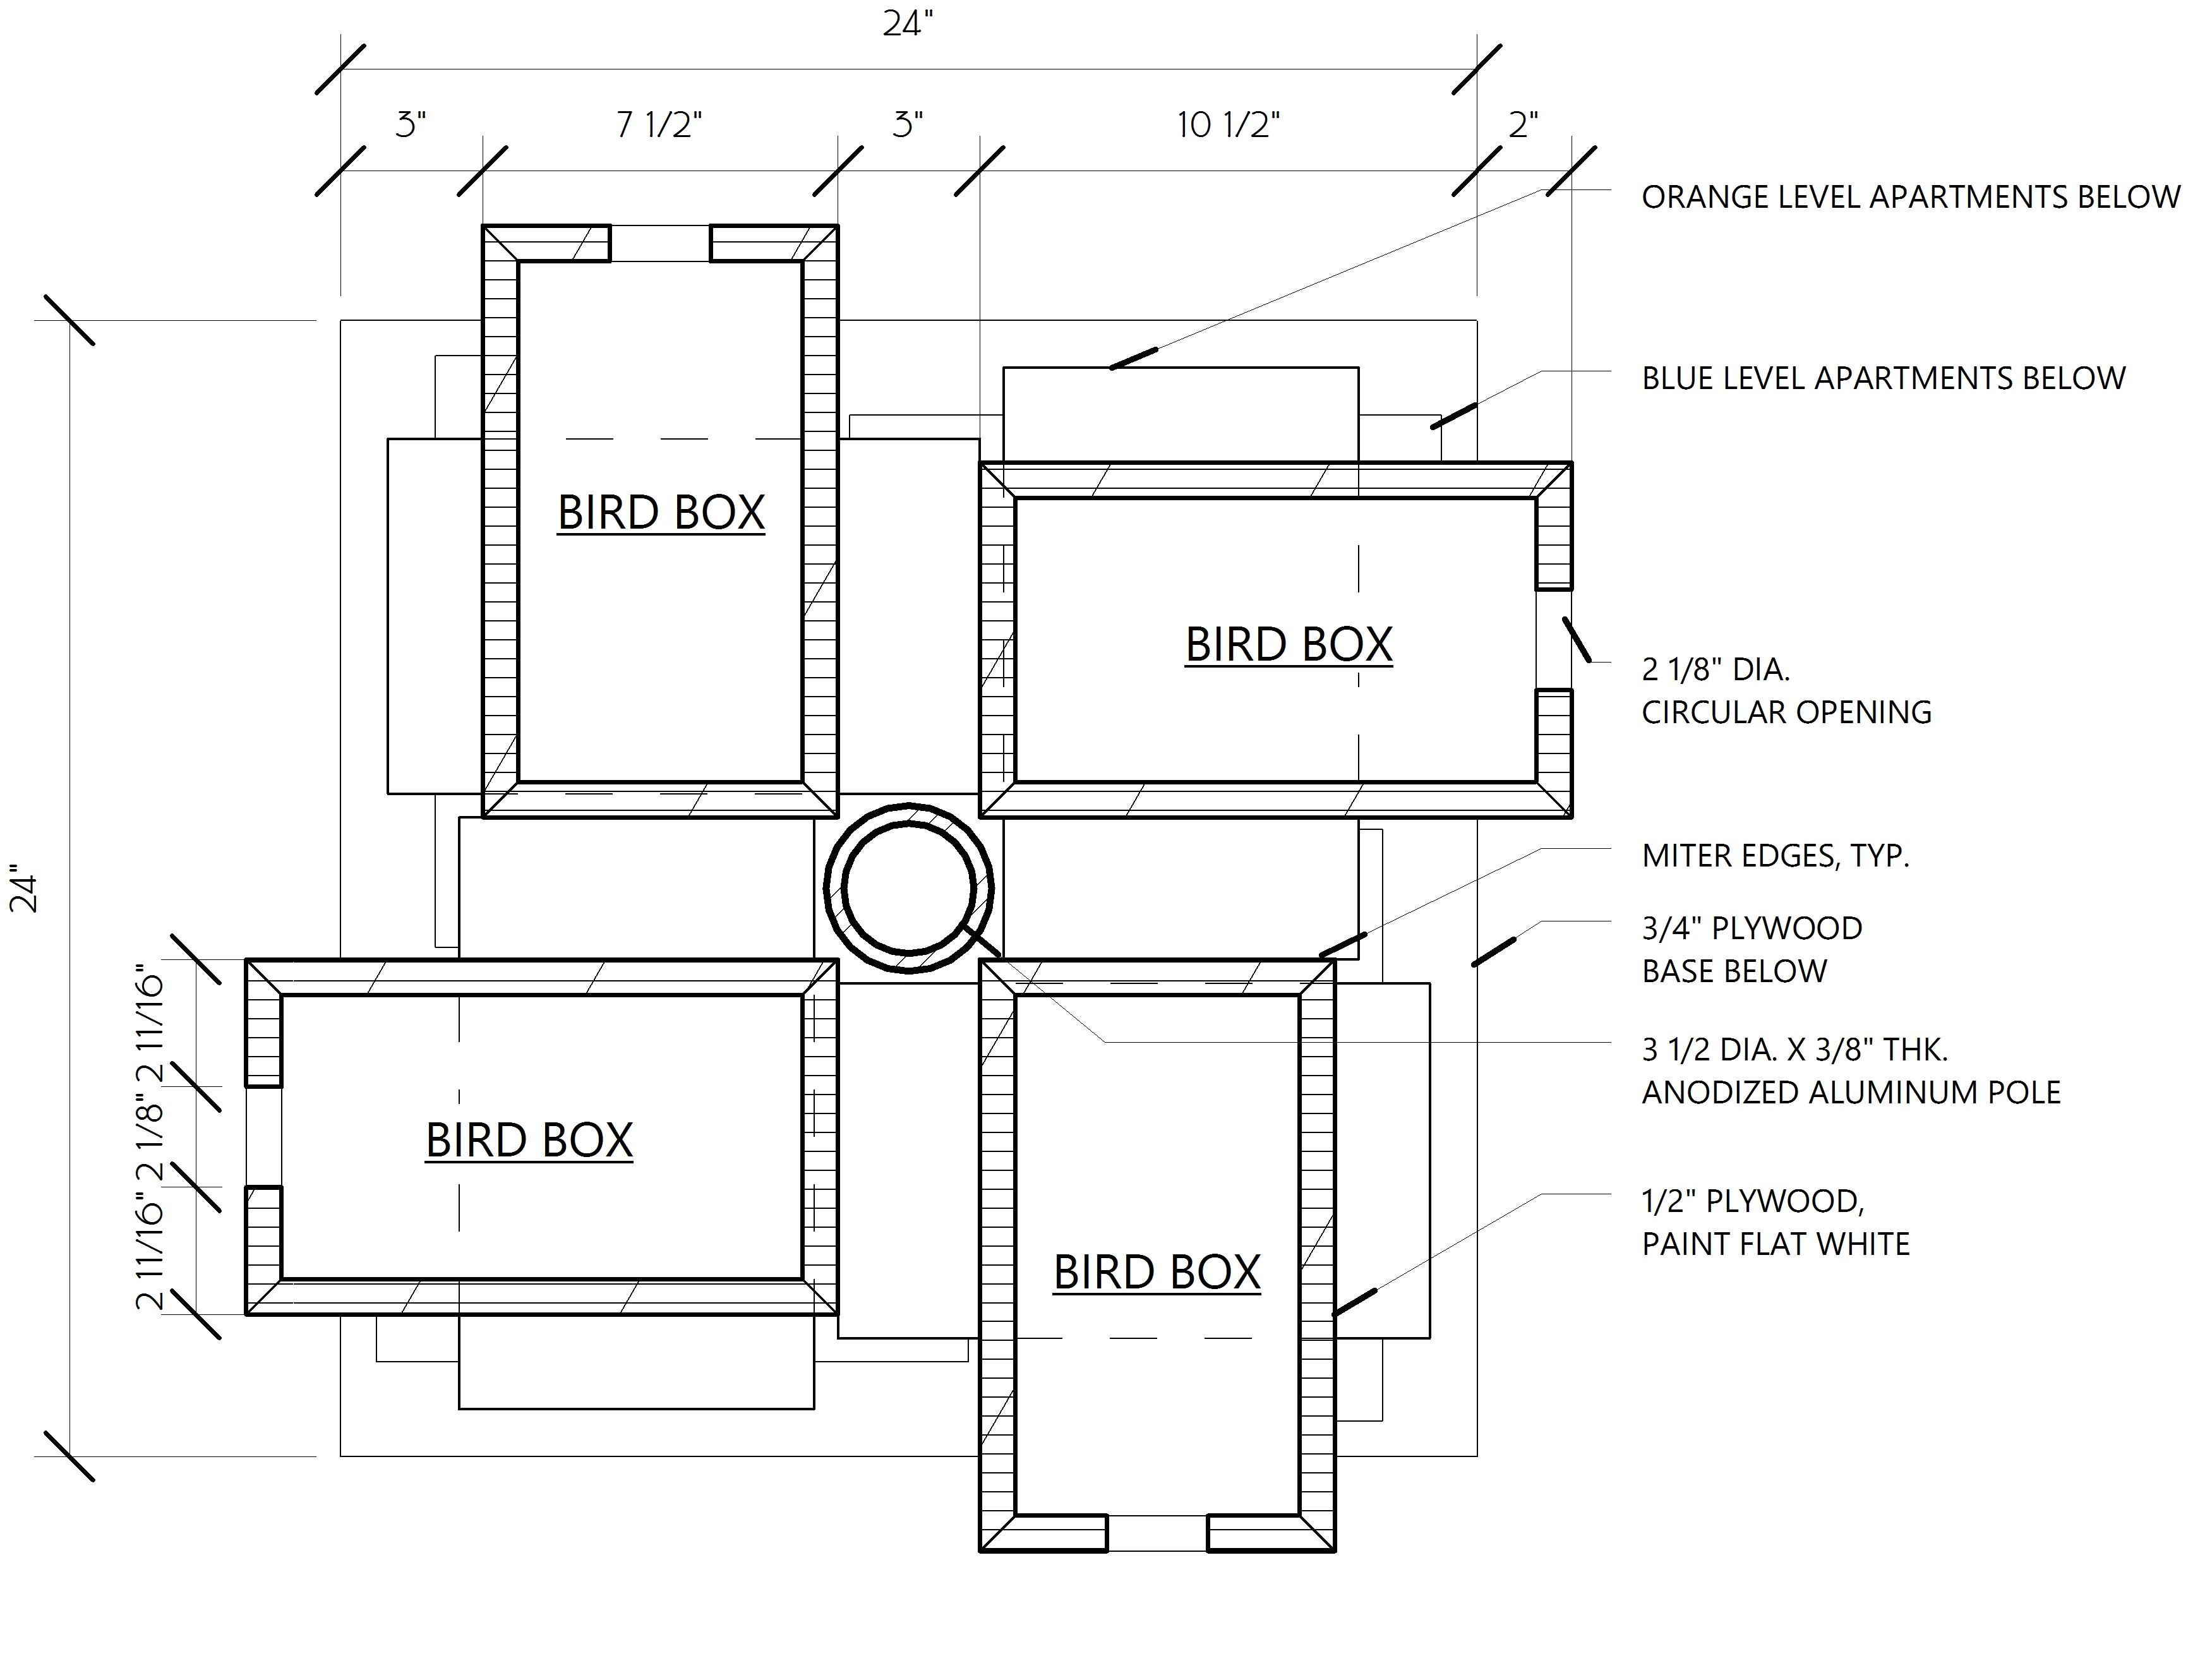 diy wooden purple martin bird house plans wooden pdf how to restore rocking horse